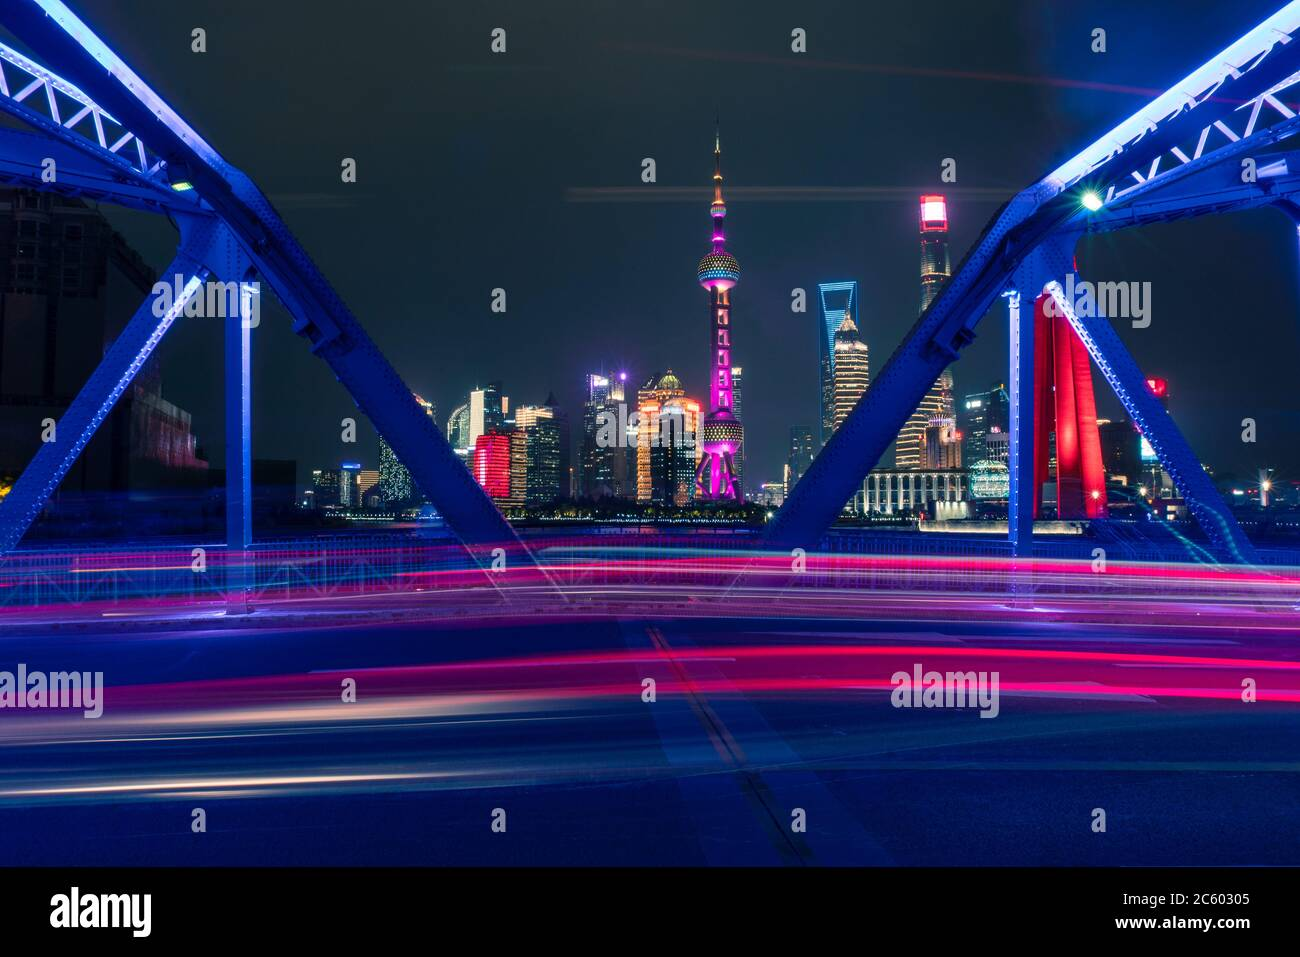 Night view of Waibaidu Bridge, a landmark steel bridge in Shanghai, with traffic and modern skyscrapers in the back. Stock Photo